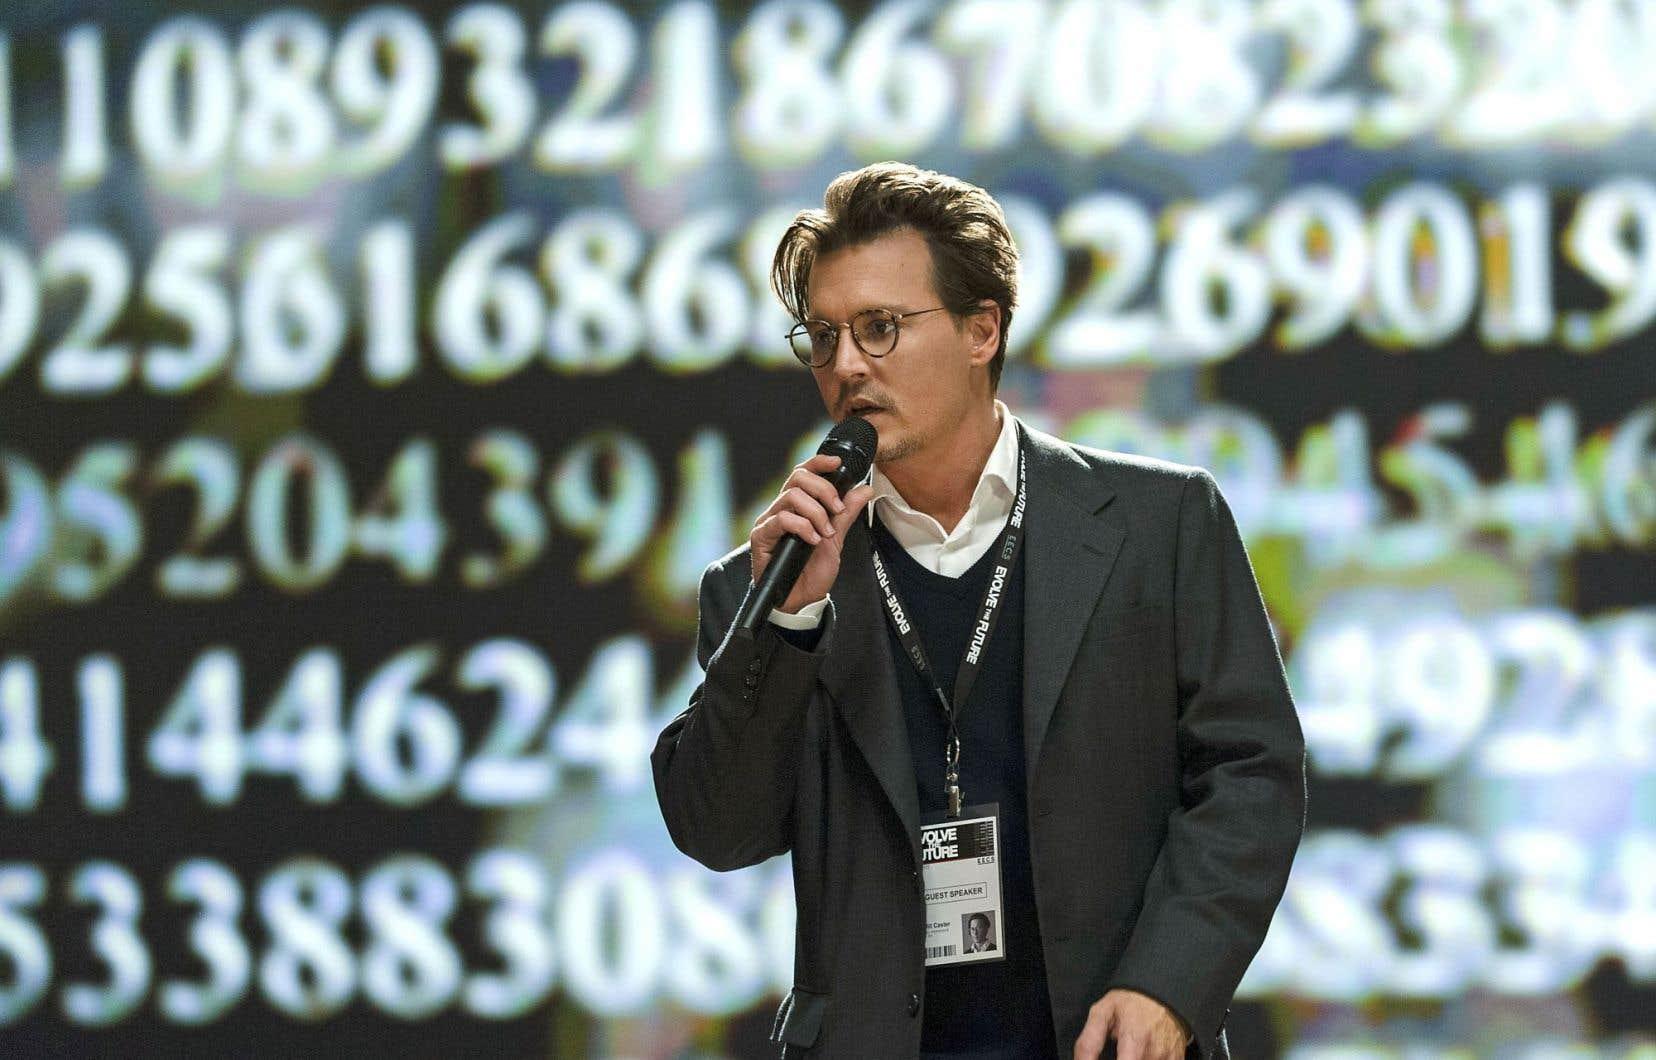 Une scène tirée du film «Transcendence», de Wally Pfister, avec Johnny Depp